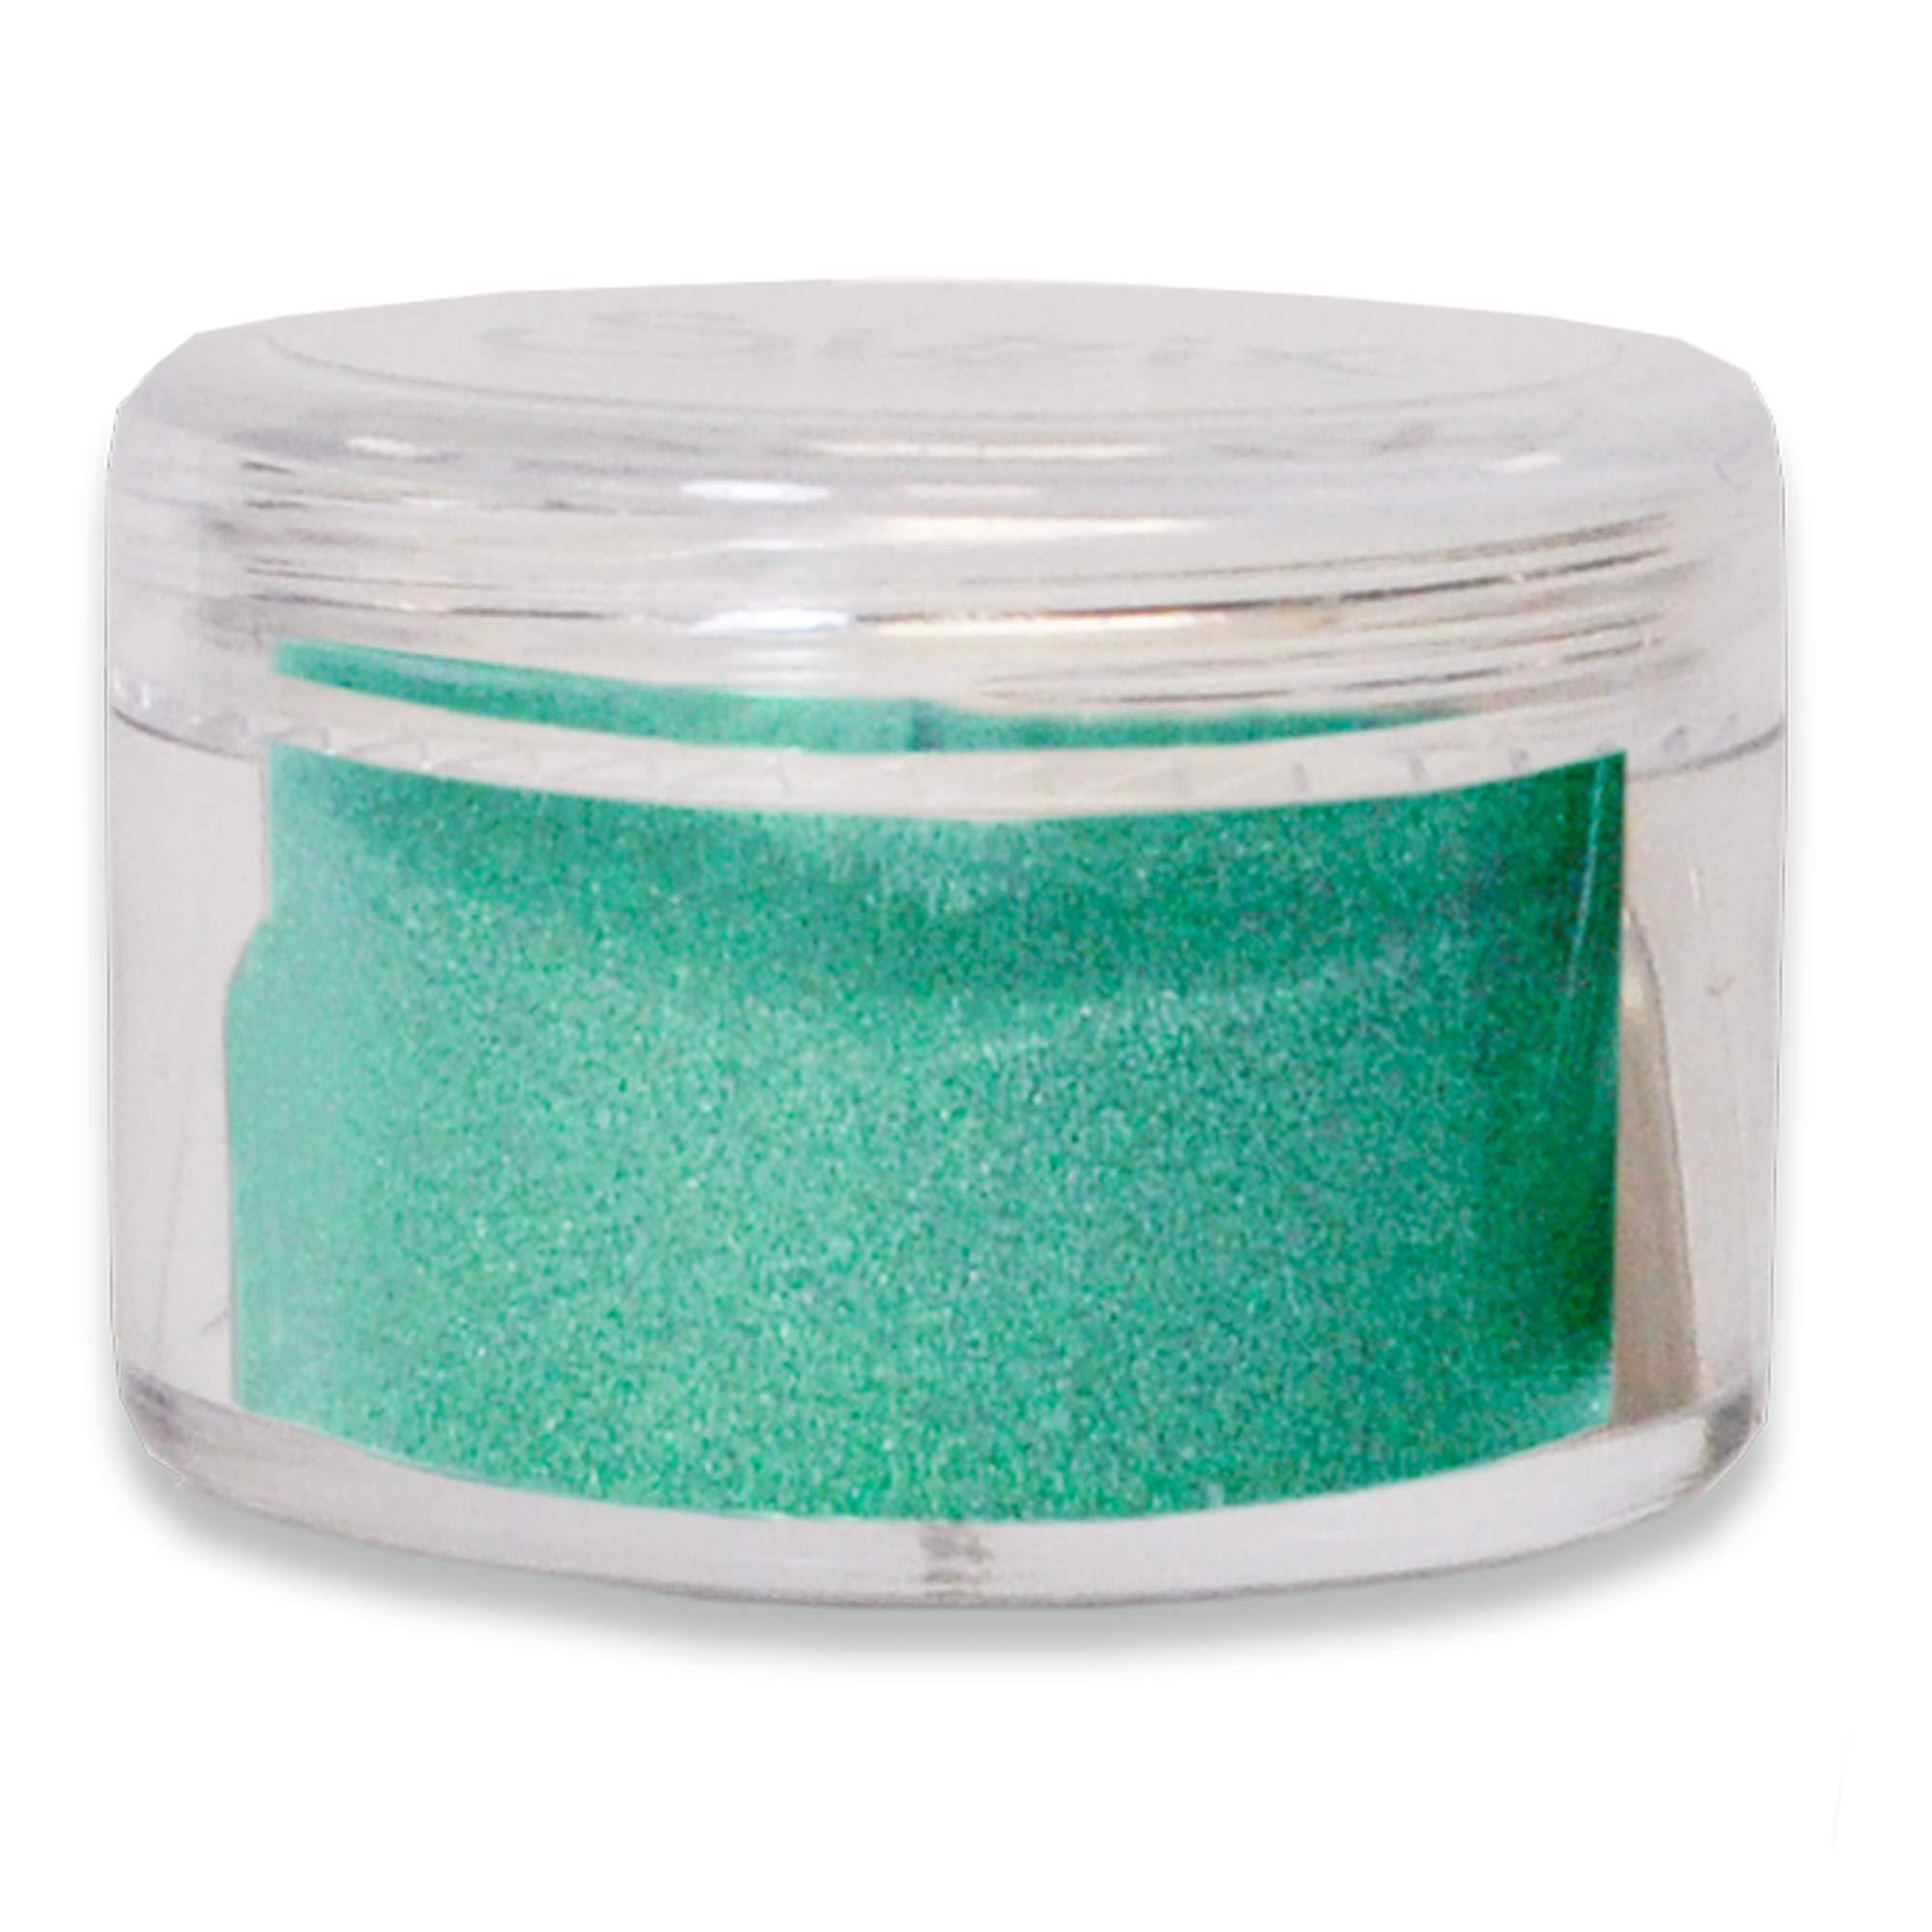 Sizzix Making Essential Opaque Mermaid Kiss 12g Embossing Powder